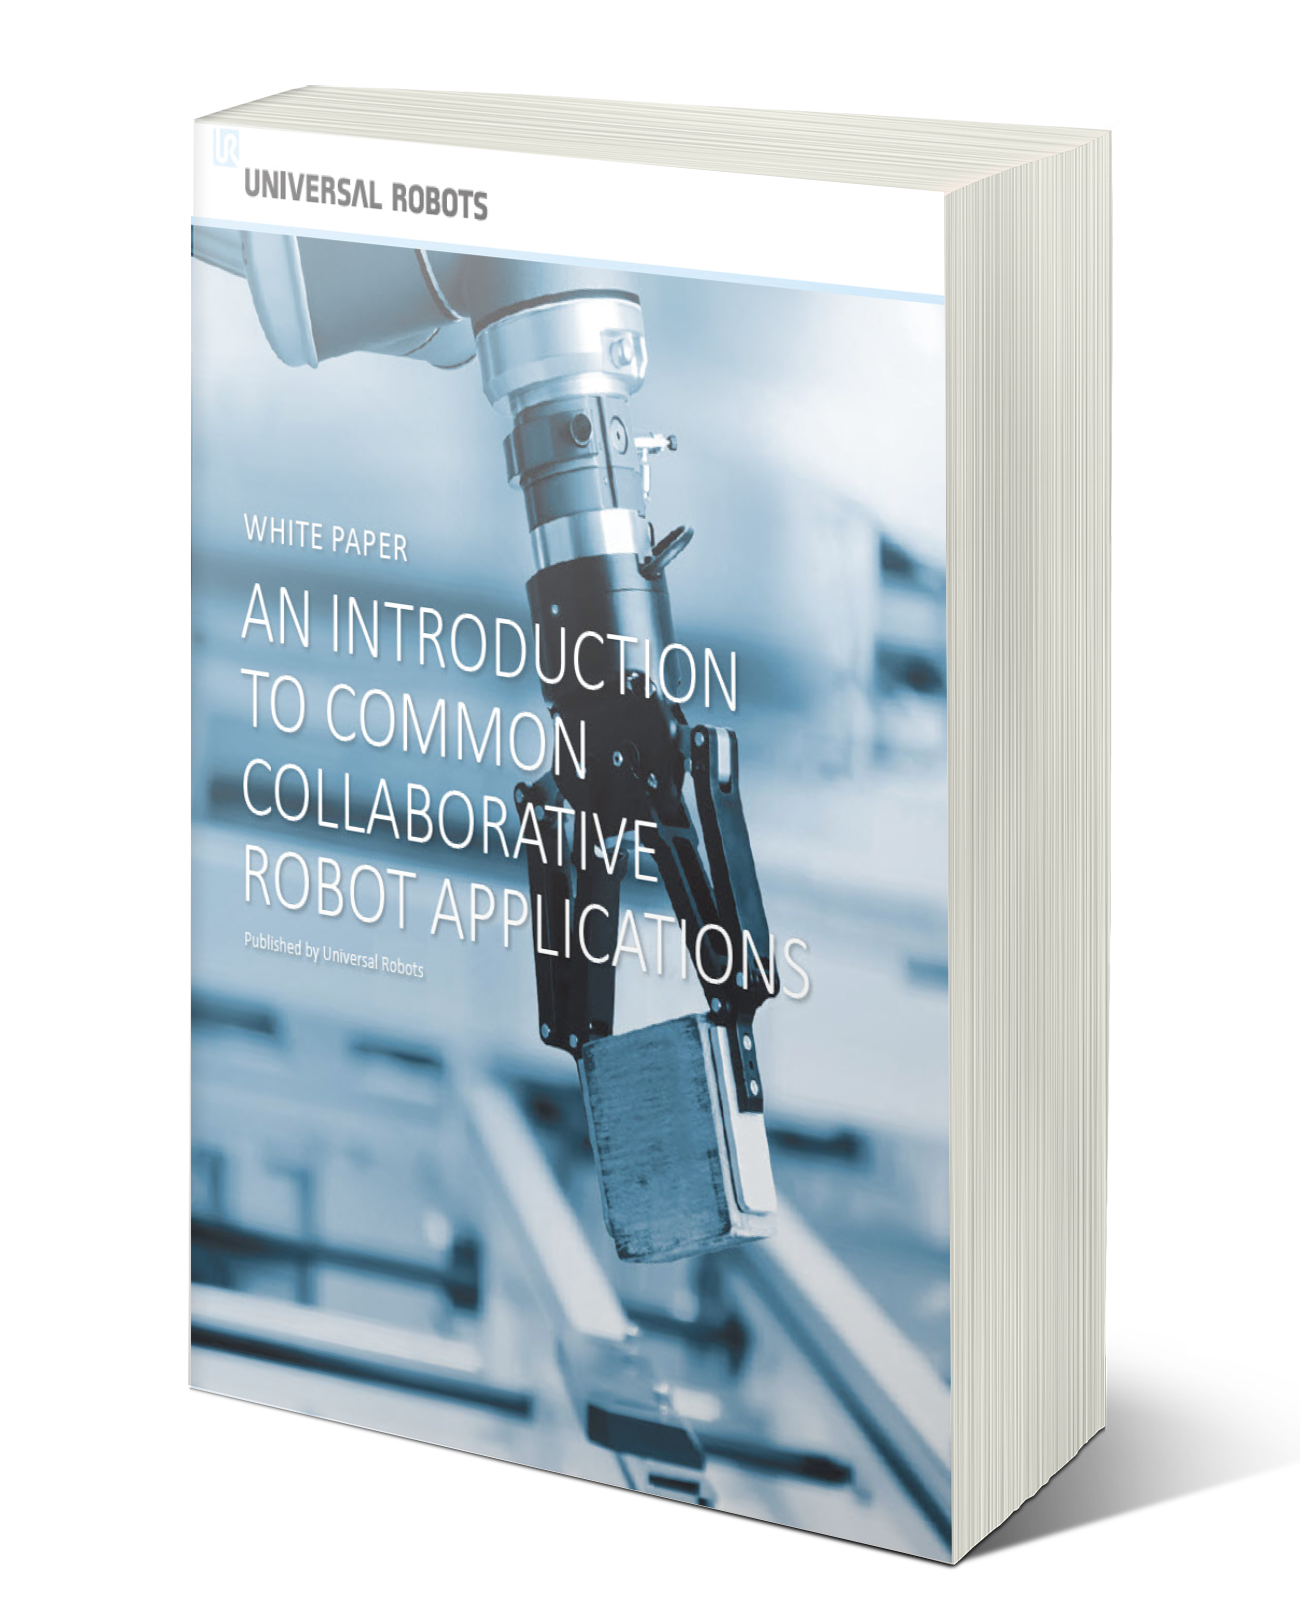 Common collaborative robot applications white paper